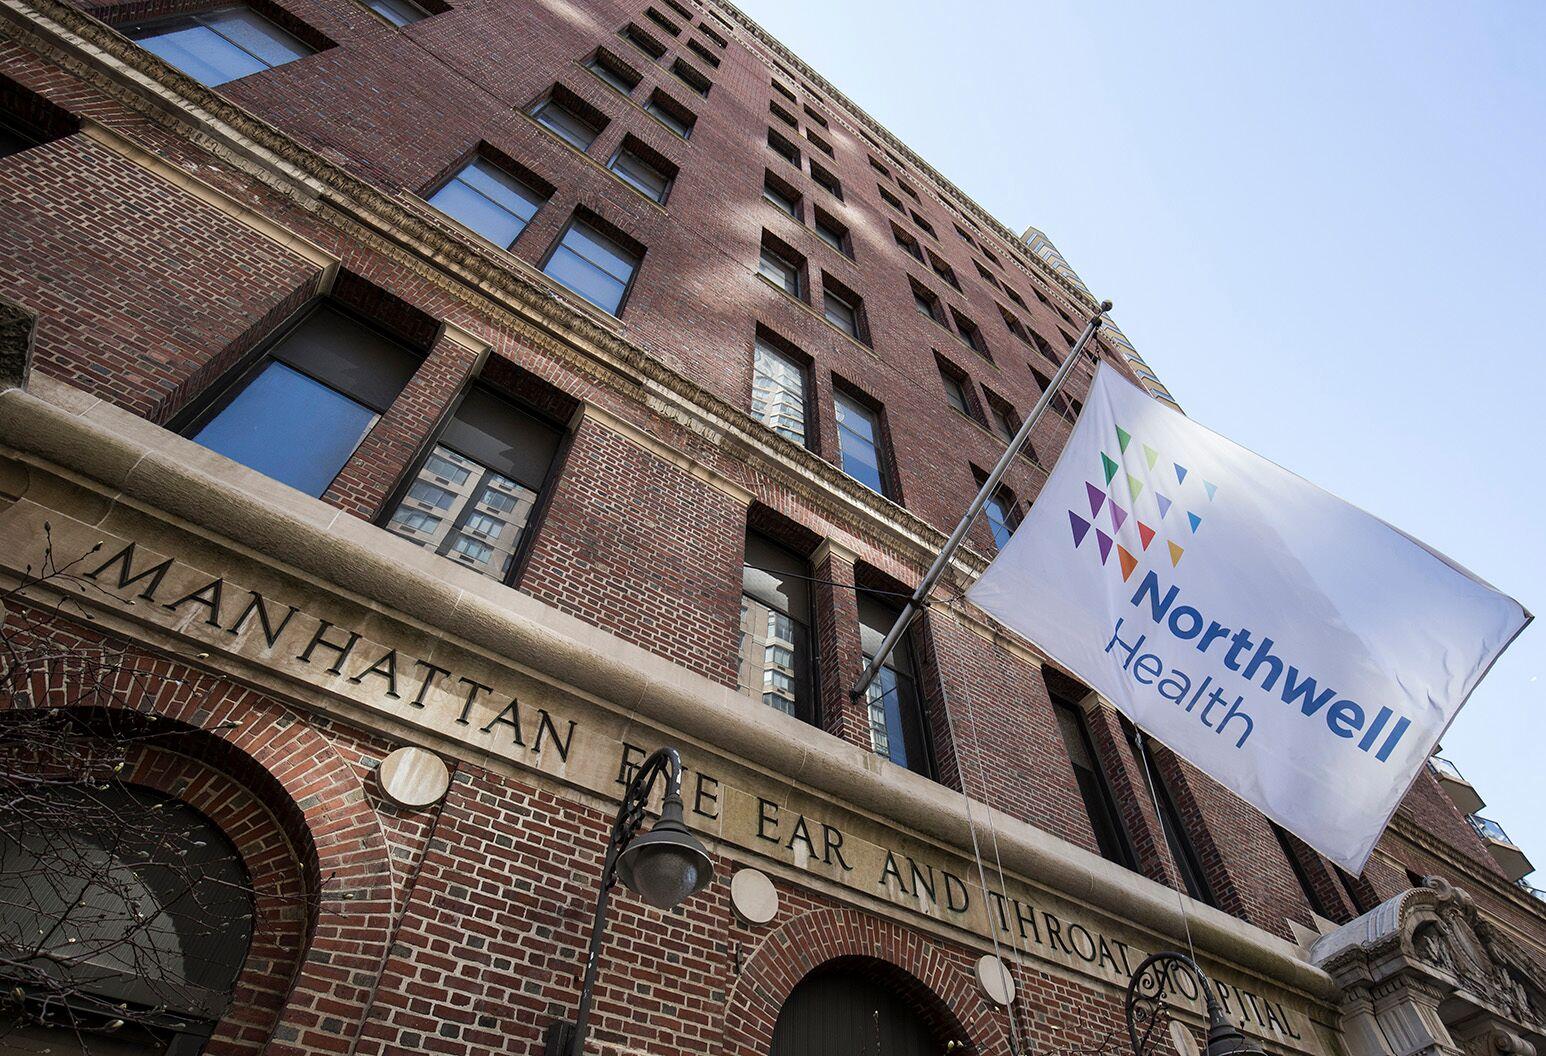 Exterior shot of Manhattan Eye, Ear and Throat Hospital from 64th street.